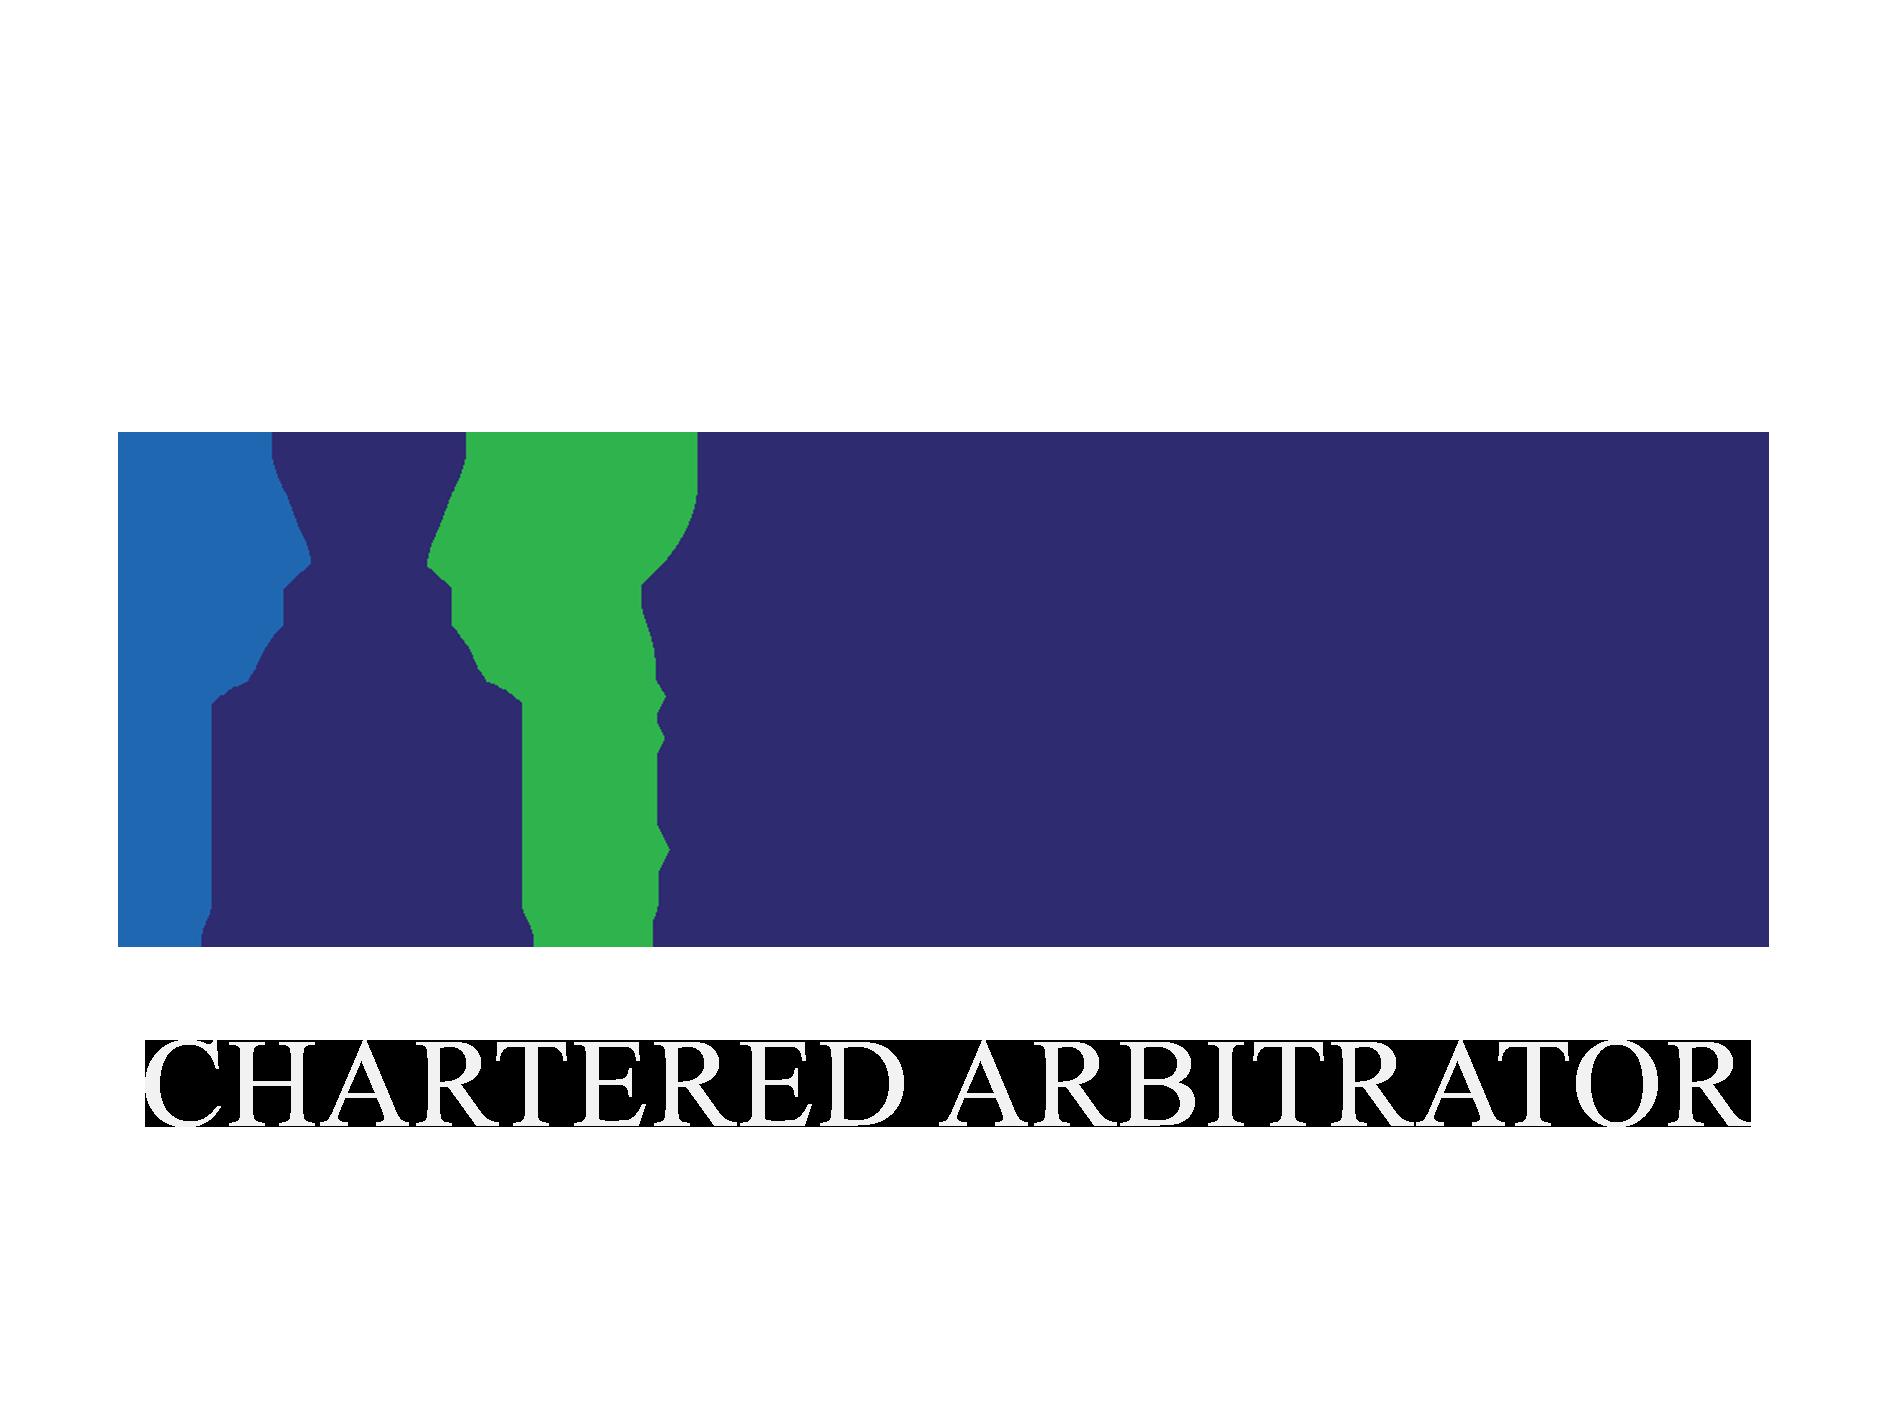 Chartered Arbitrator